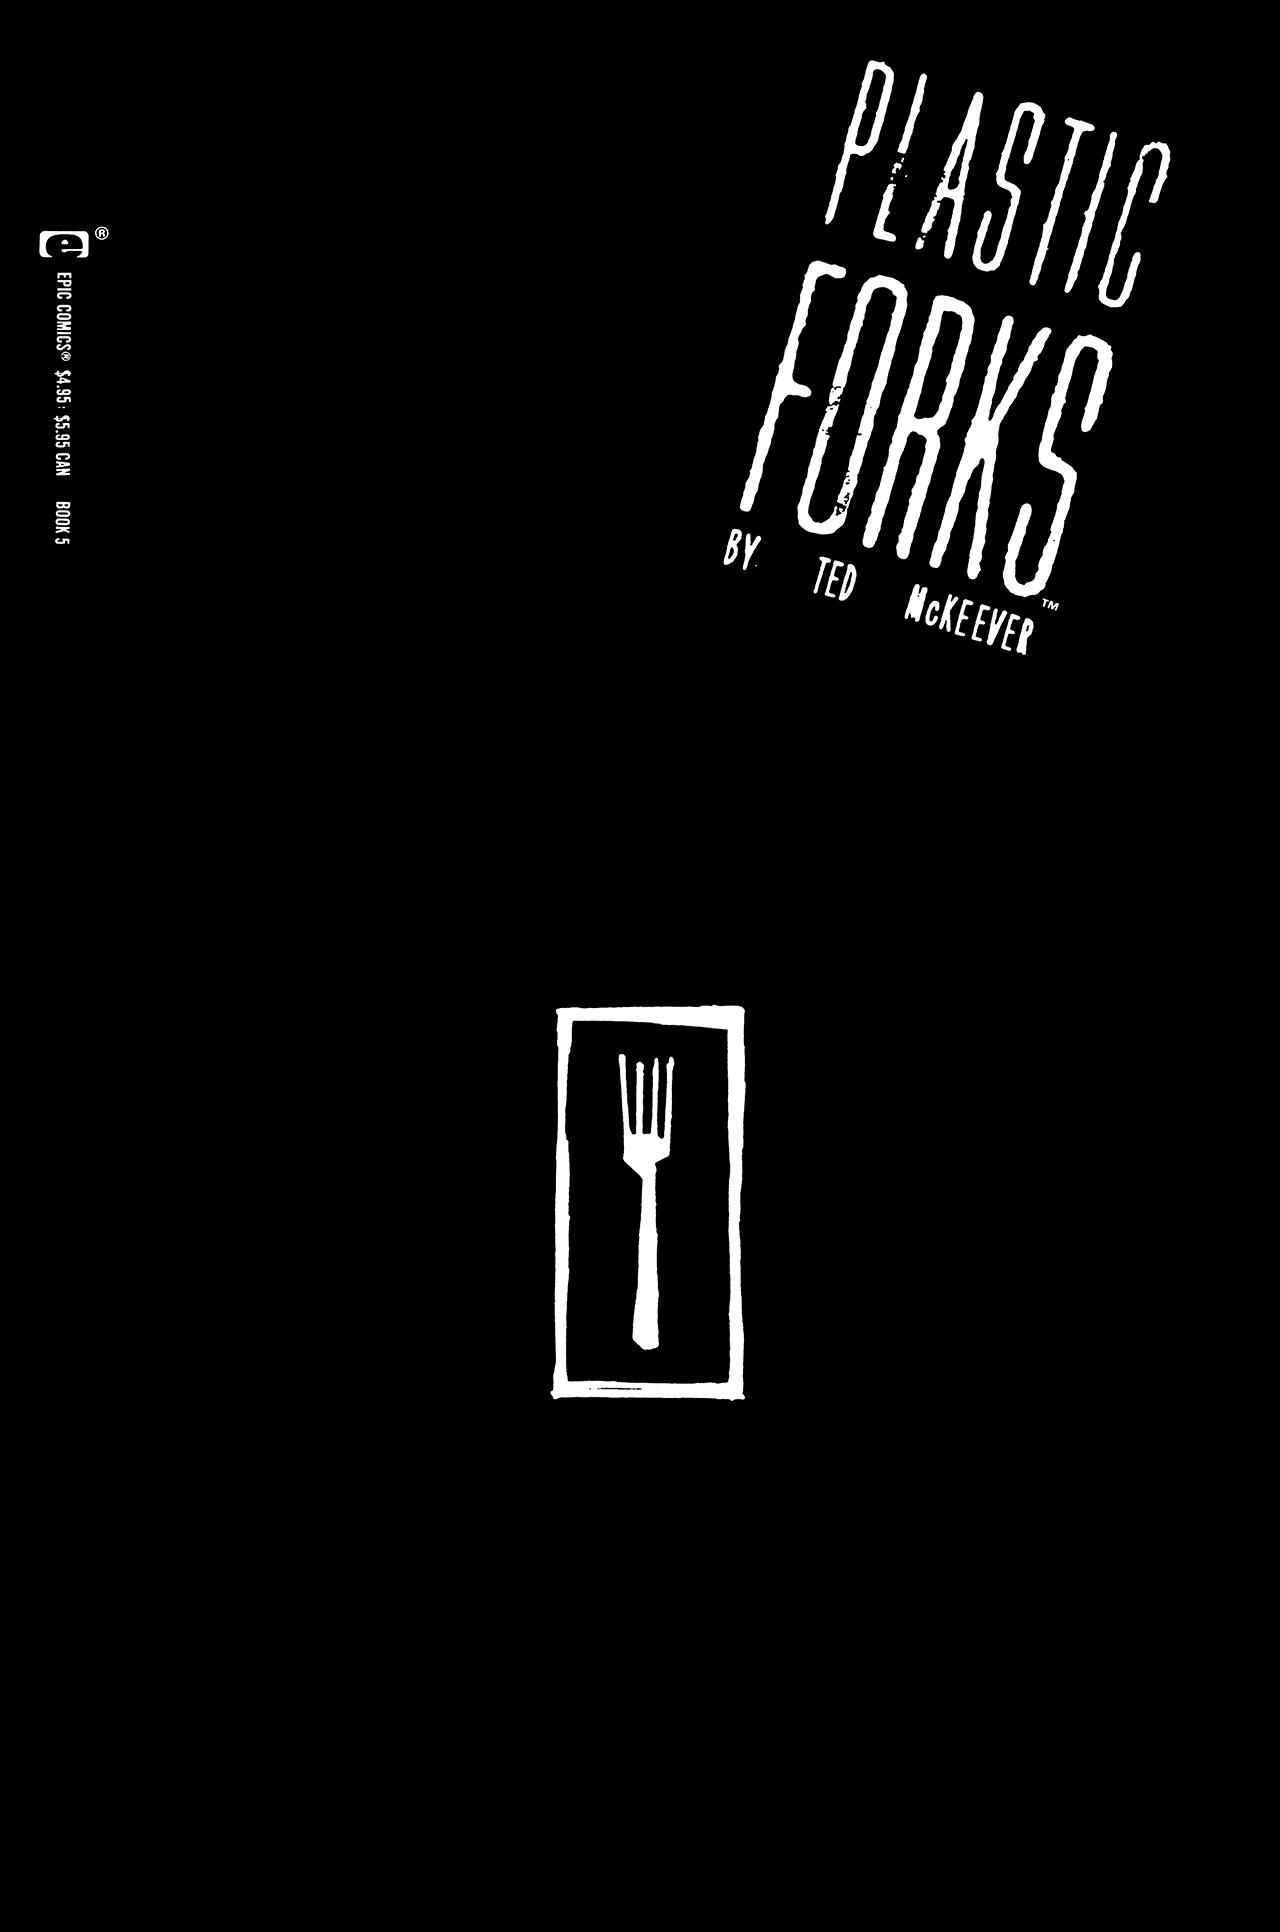 Plastic Forks 5 Page 1